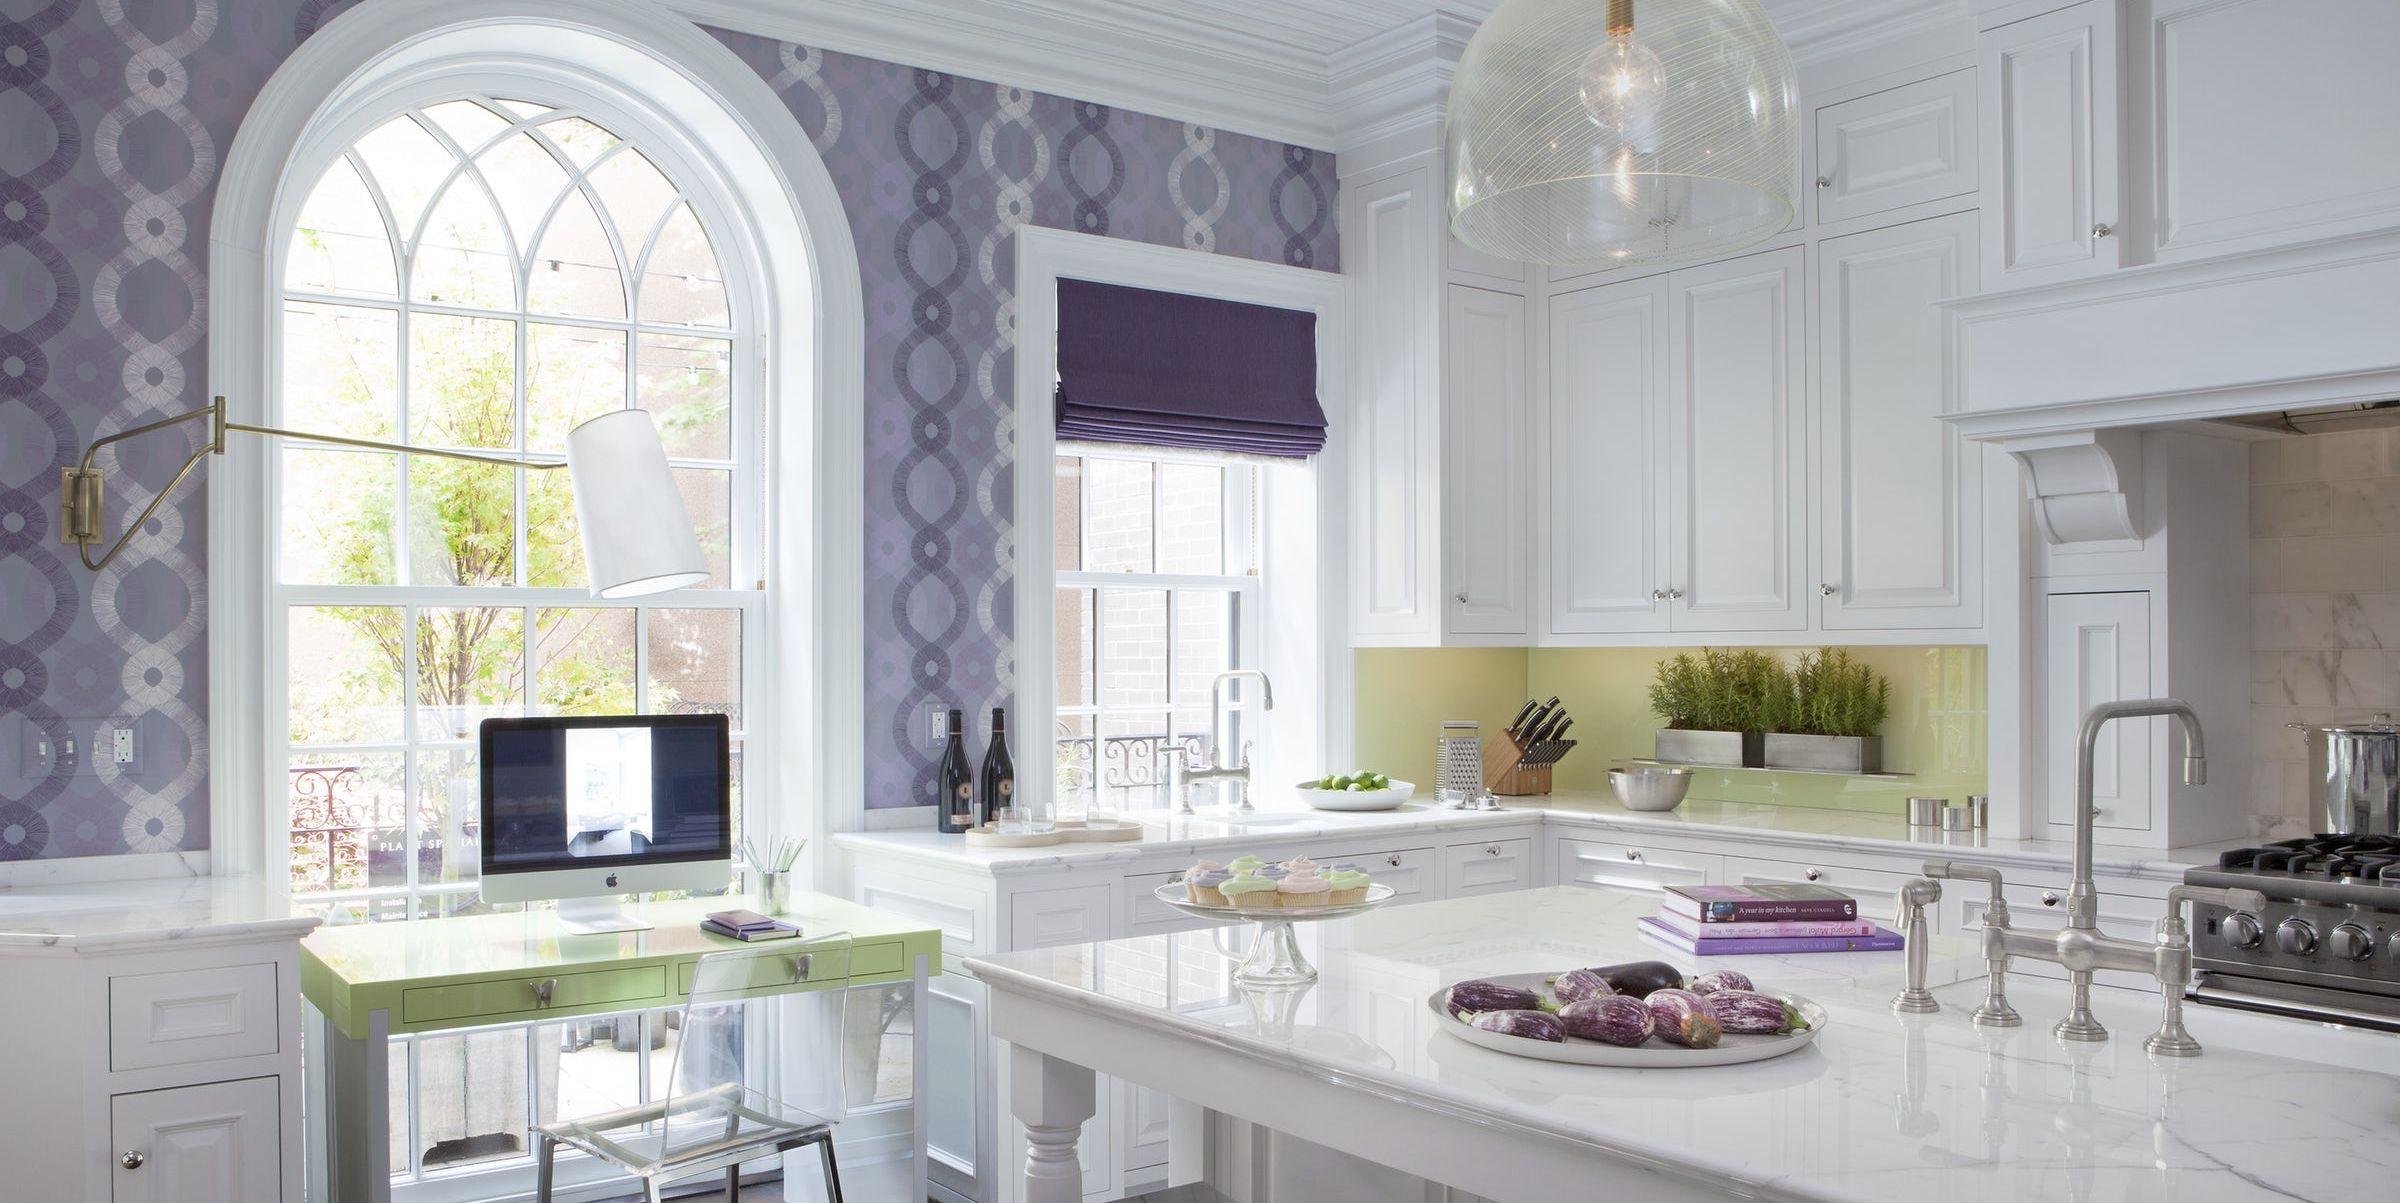 30 Modern Wallpaper Design Ideas Colorful Designer Wallpaper For Walls